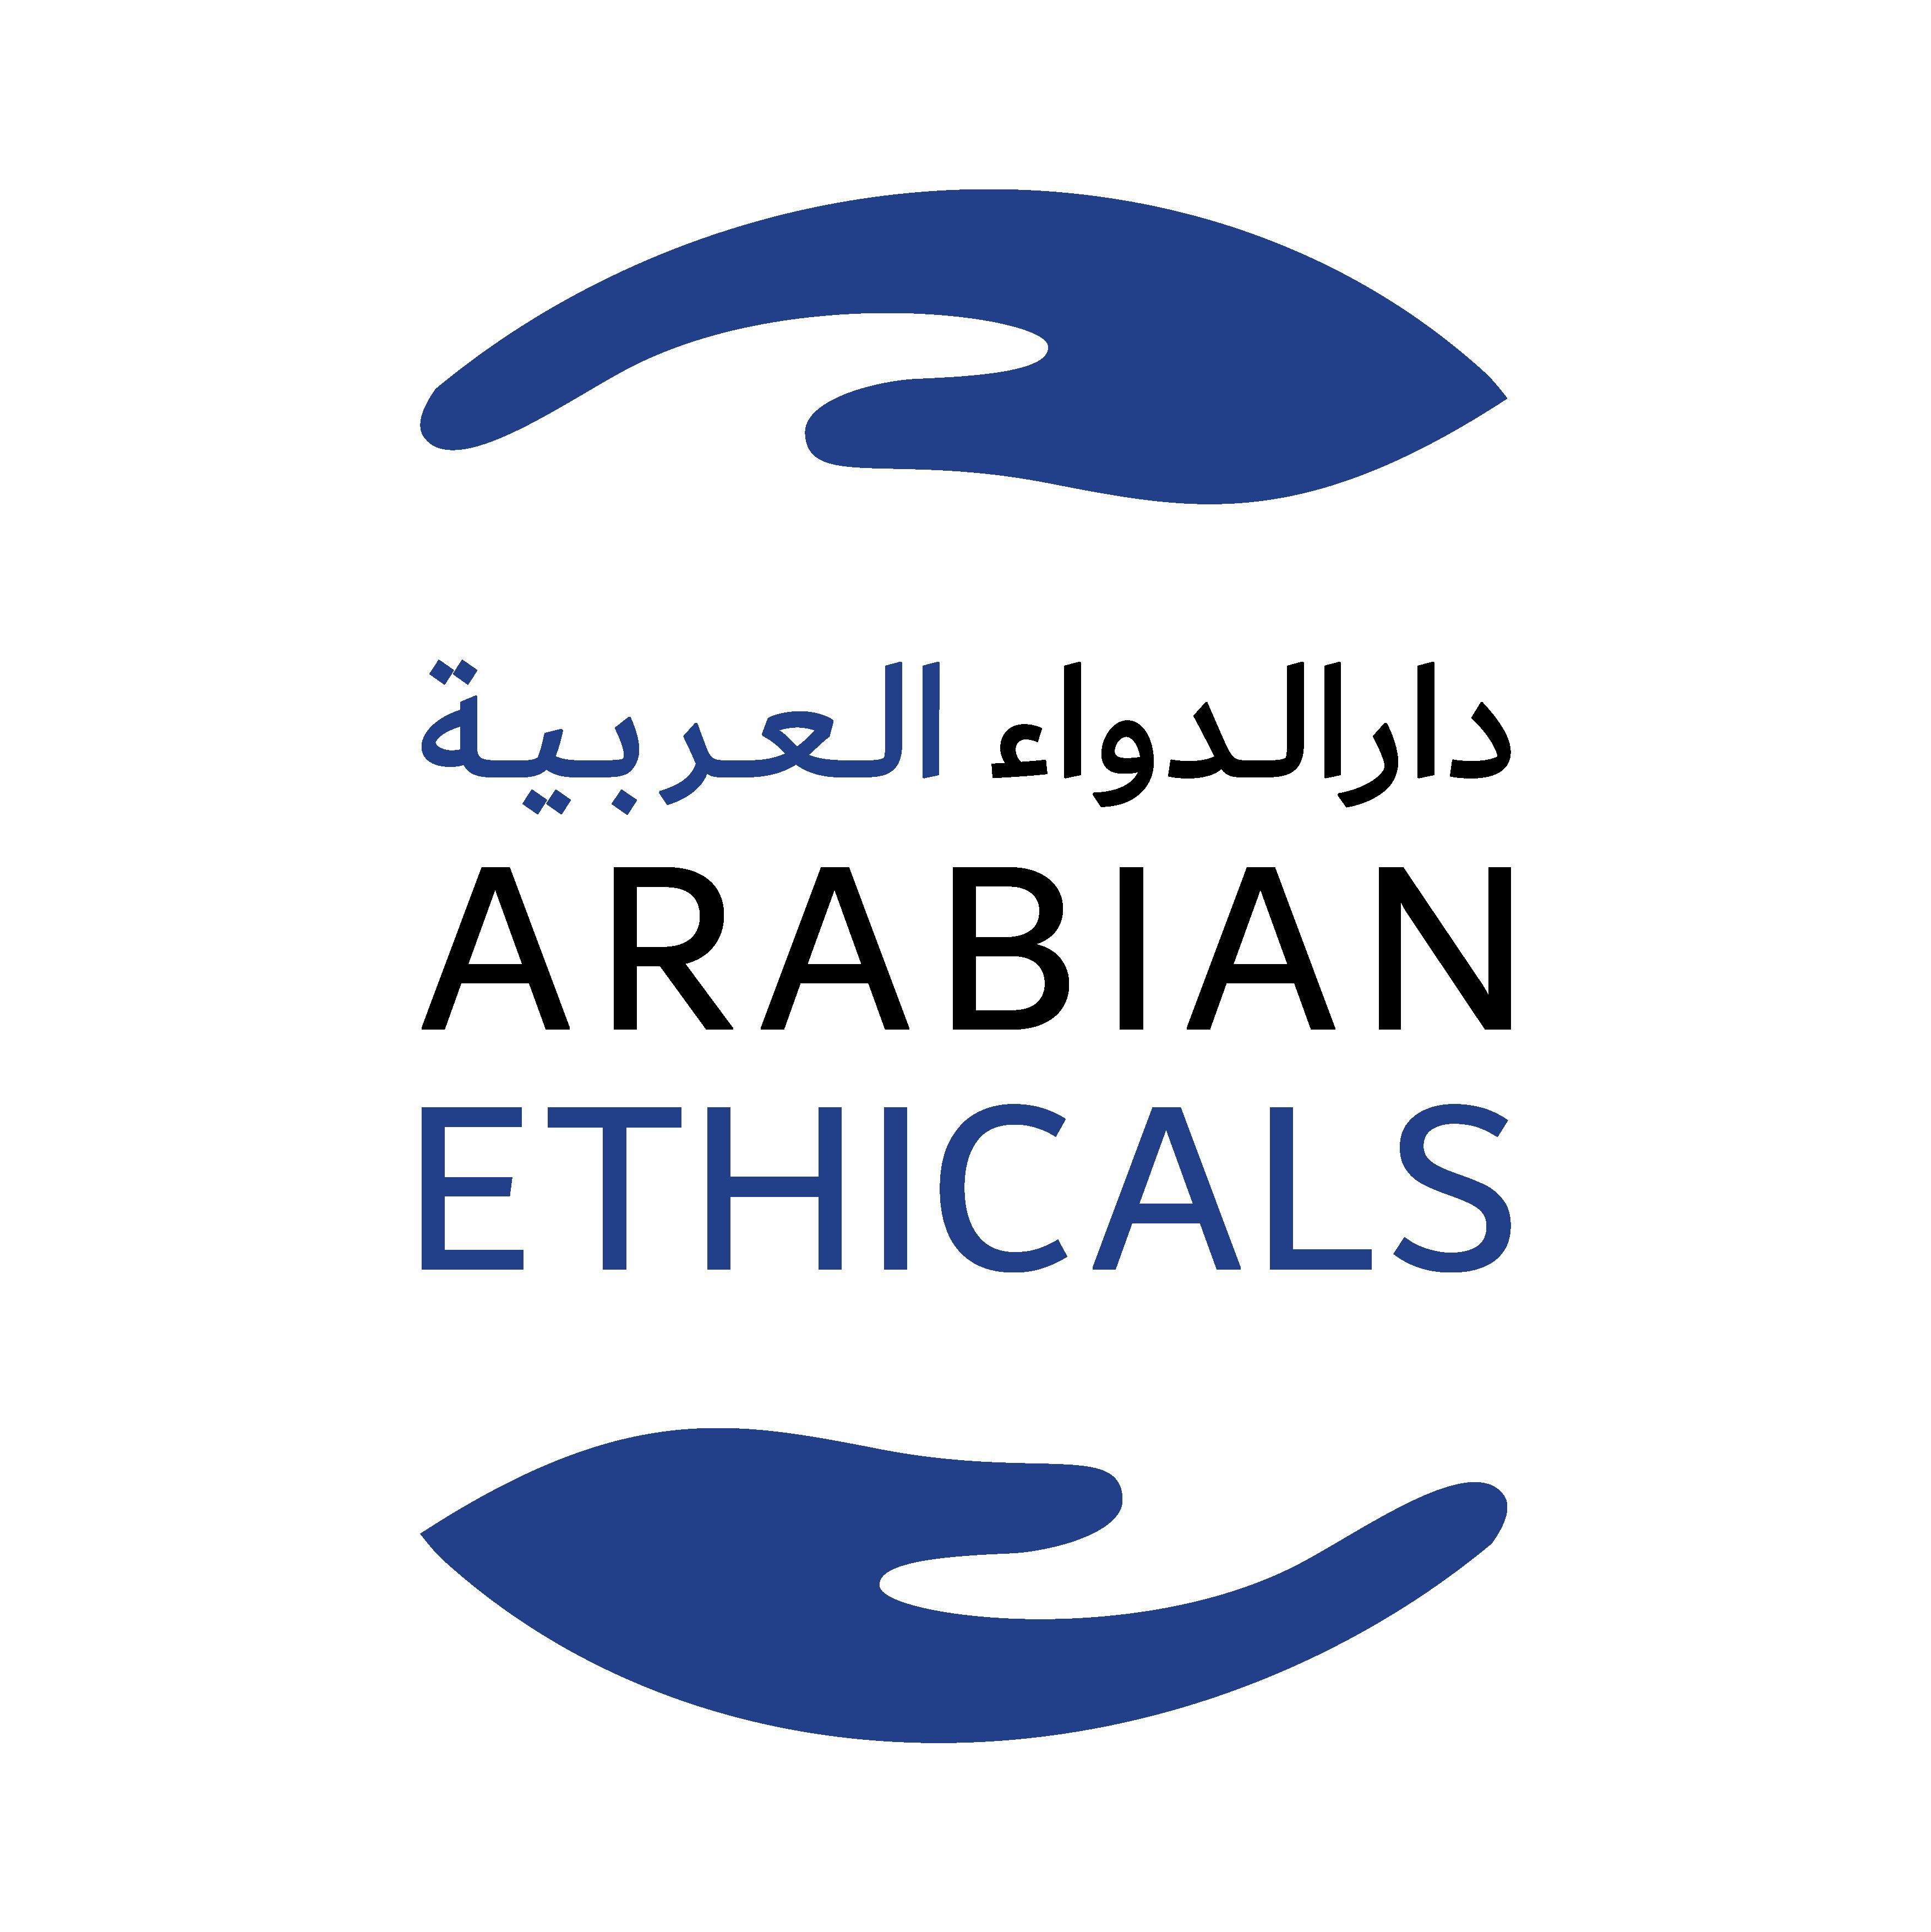 Arabian Ethicals Co